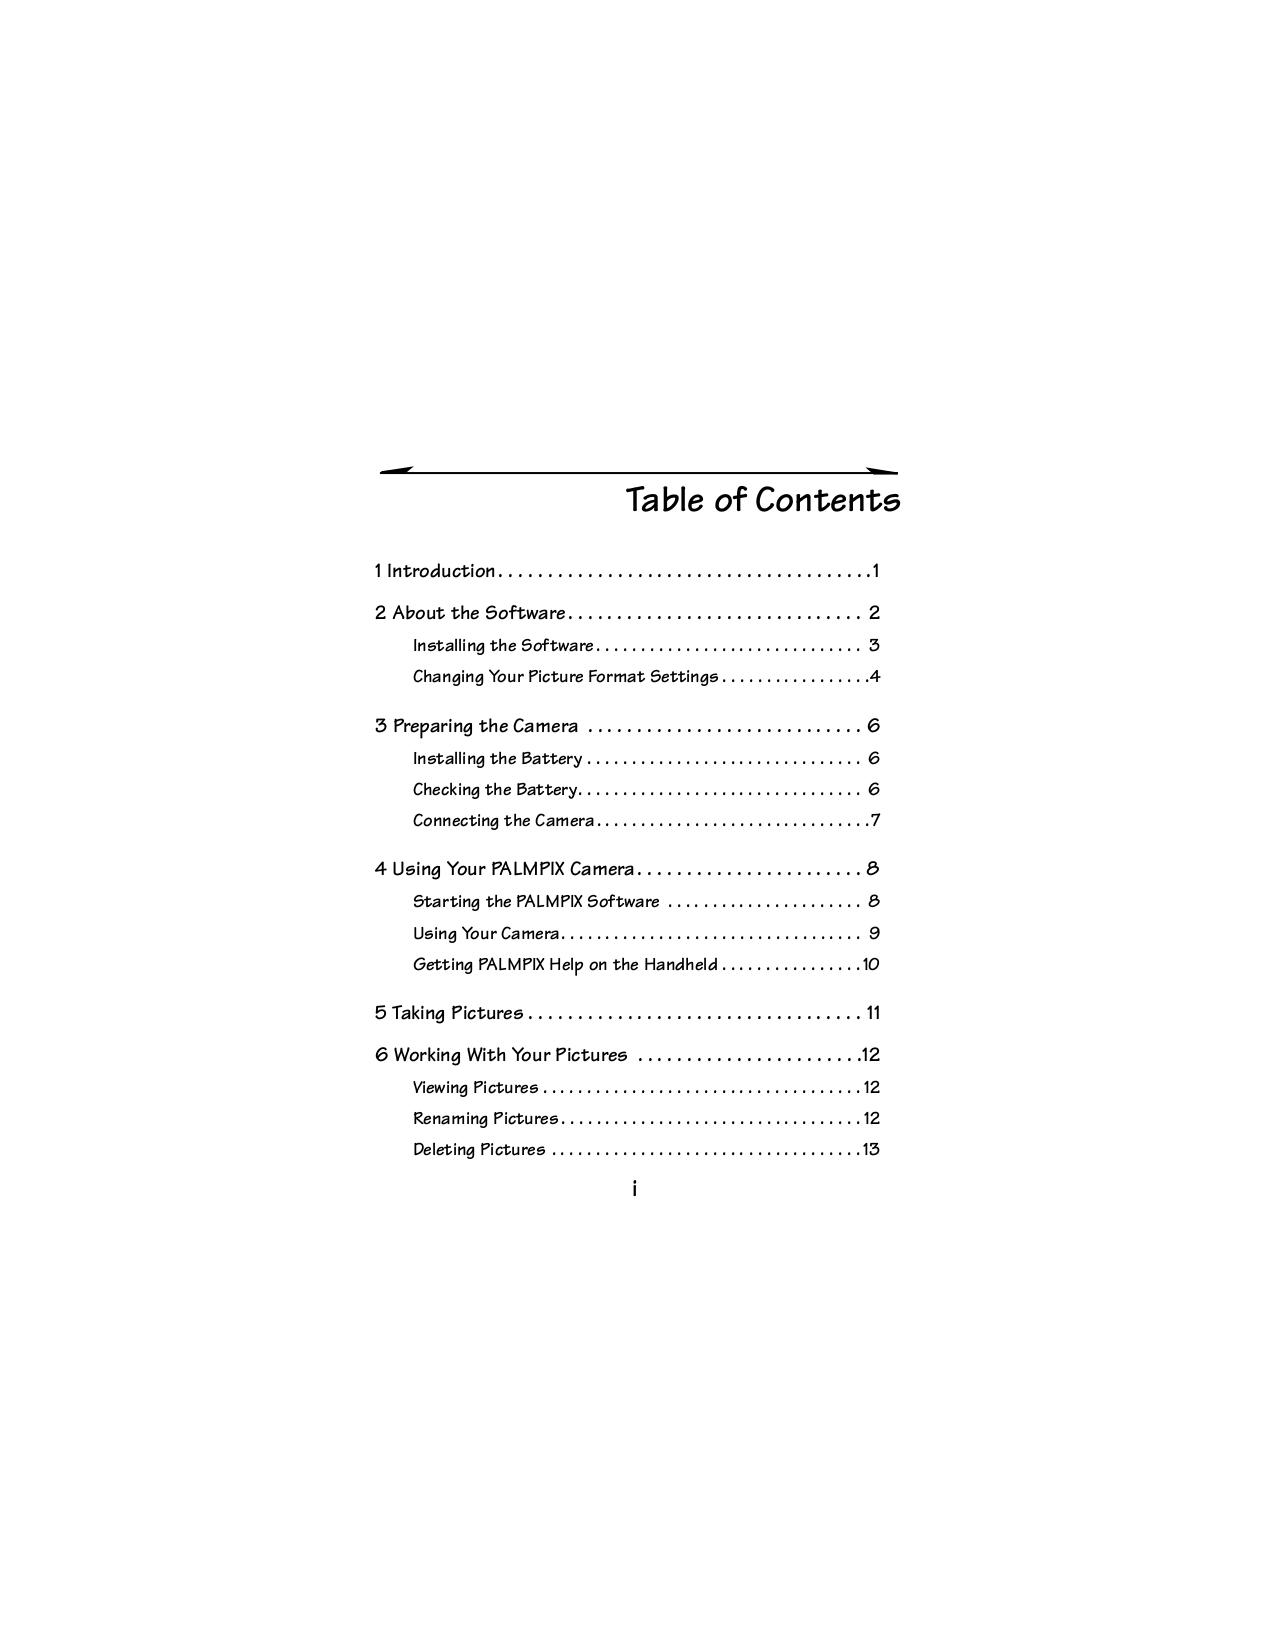 pdf for Kodak Camcorders PalmPix m100 manual